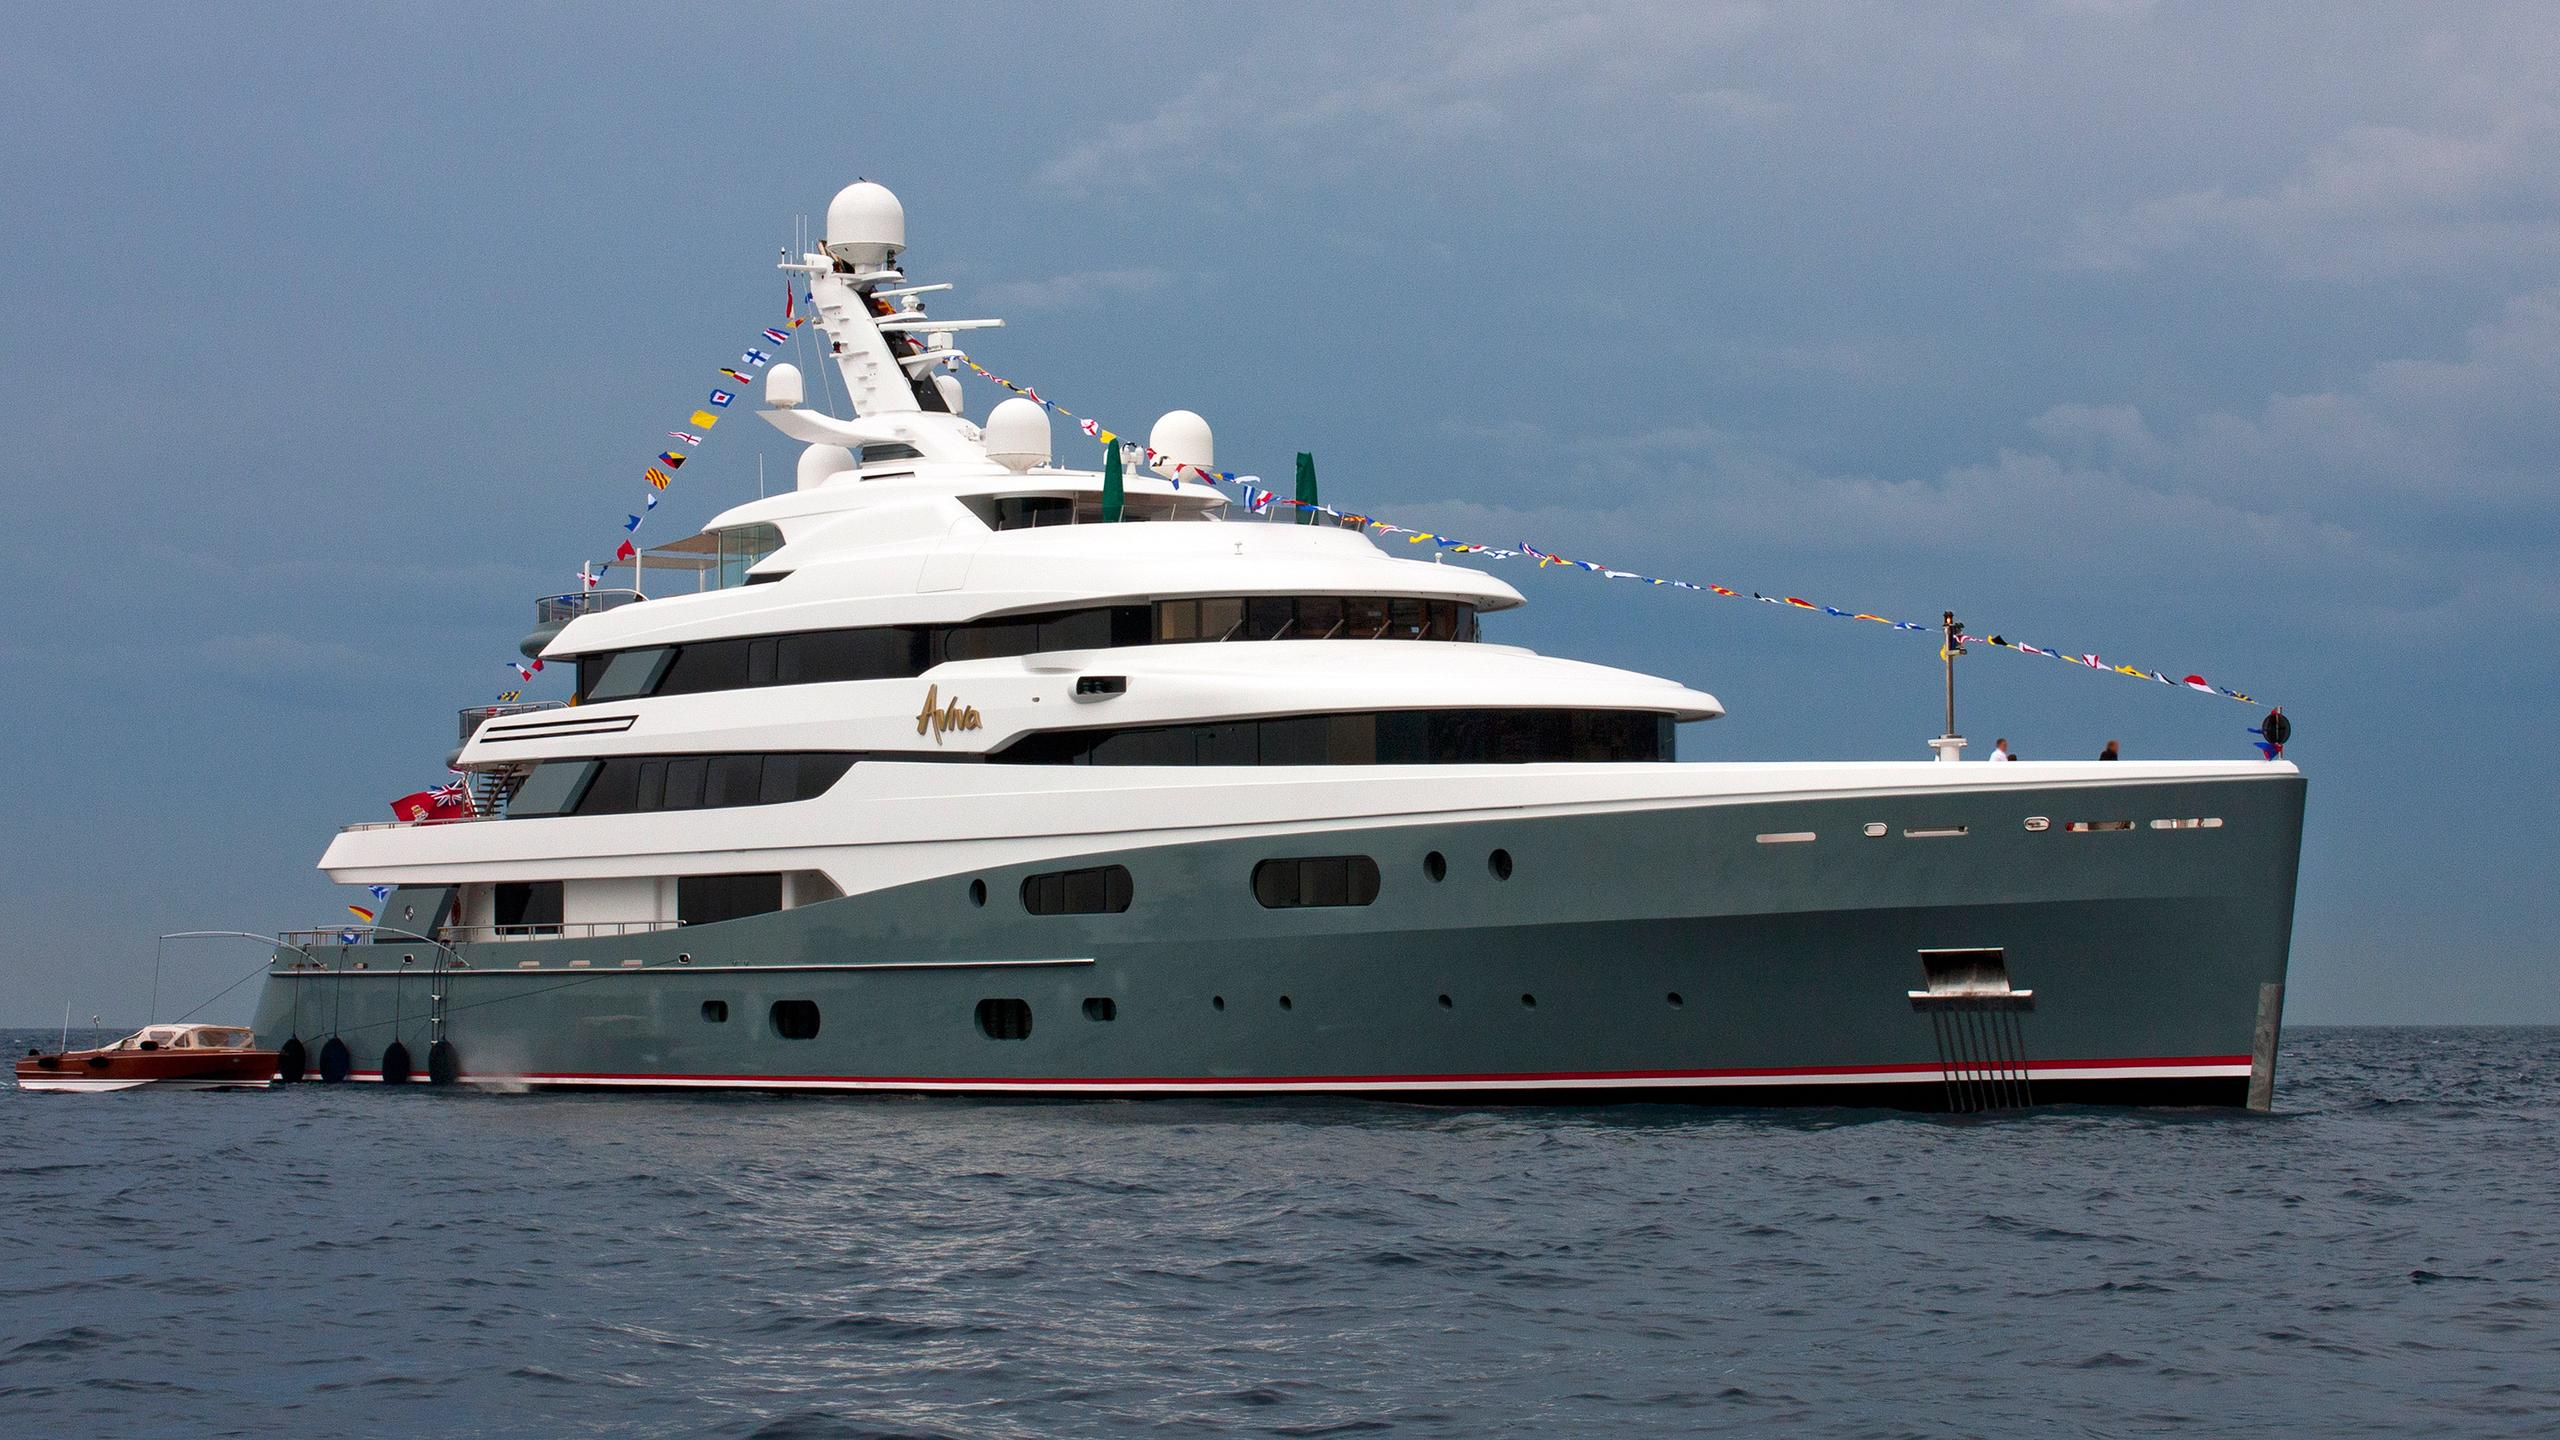 aviva-motor-yacht-abeking-rasmussen-2007-68m-bow